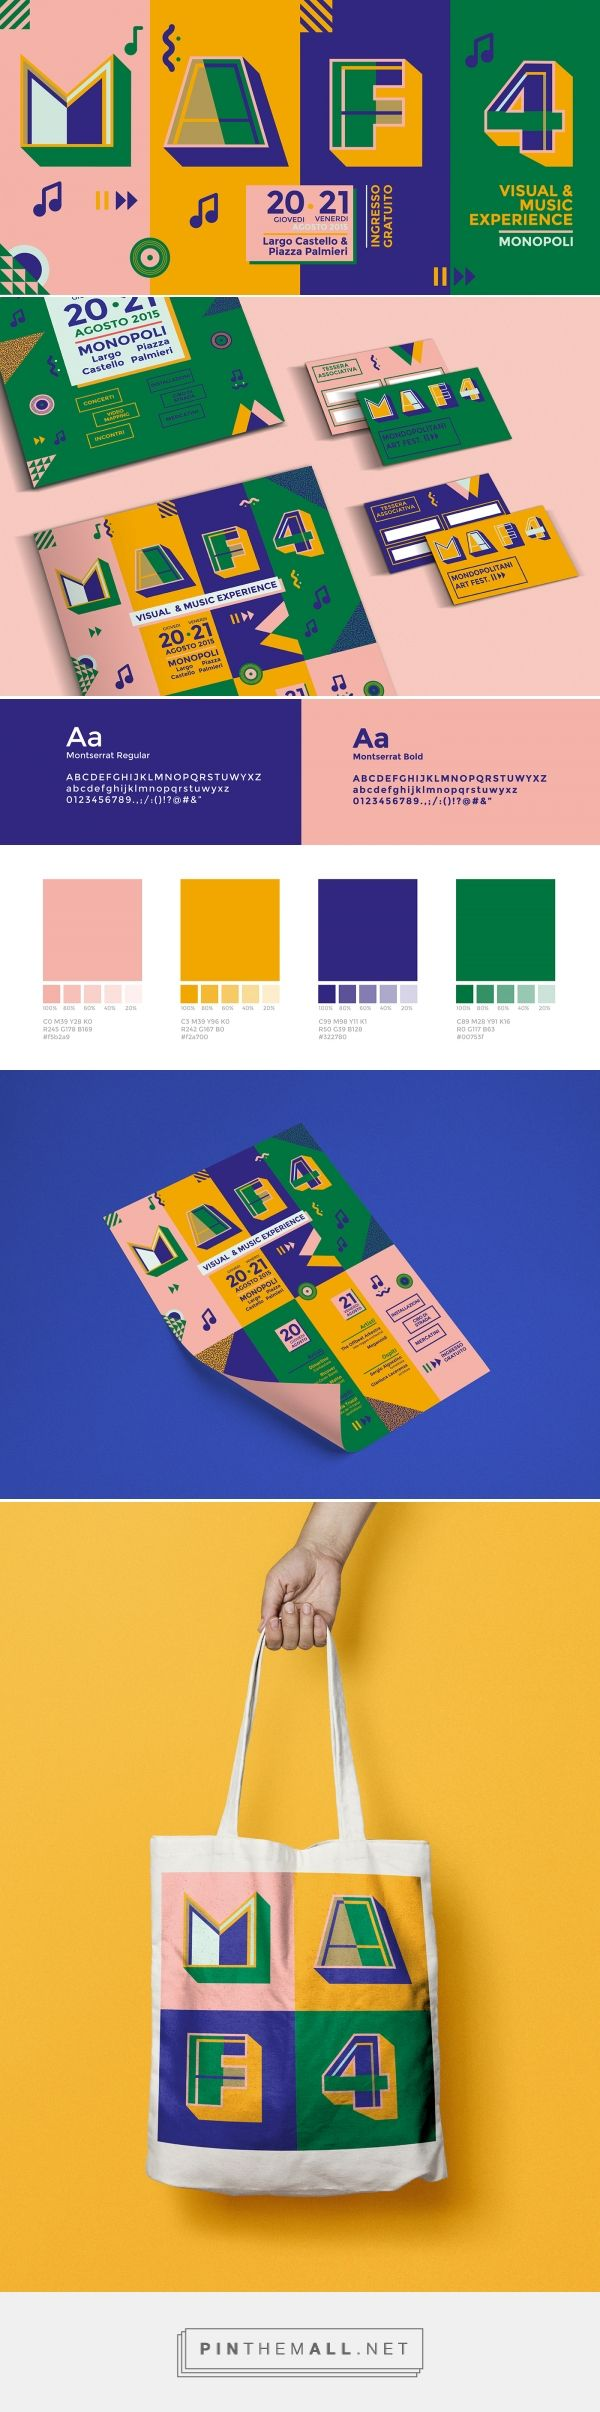 Mondopolitani Art Fest Branding by Claudia Alexandrino | Fivestar Branding Agency – Design and Branding Agency & Curated Inspiration Gallery